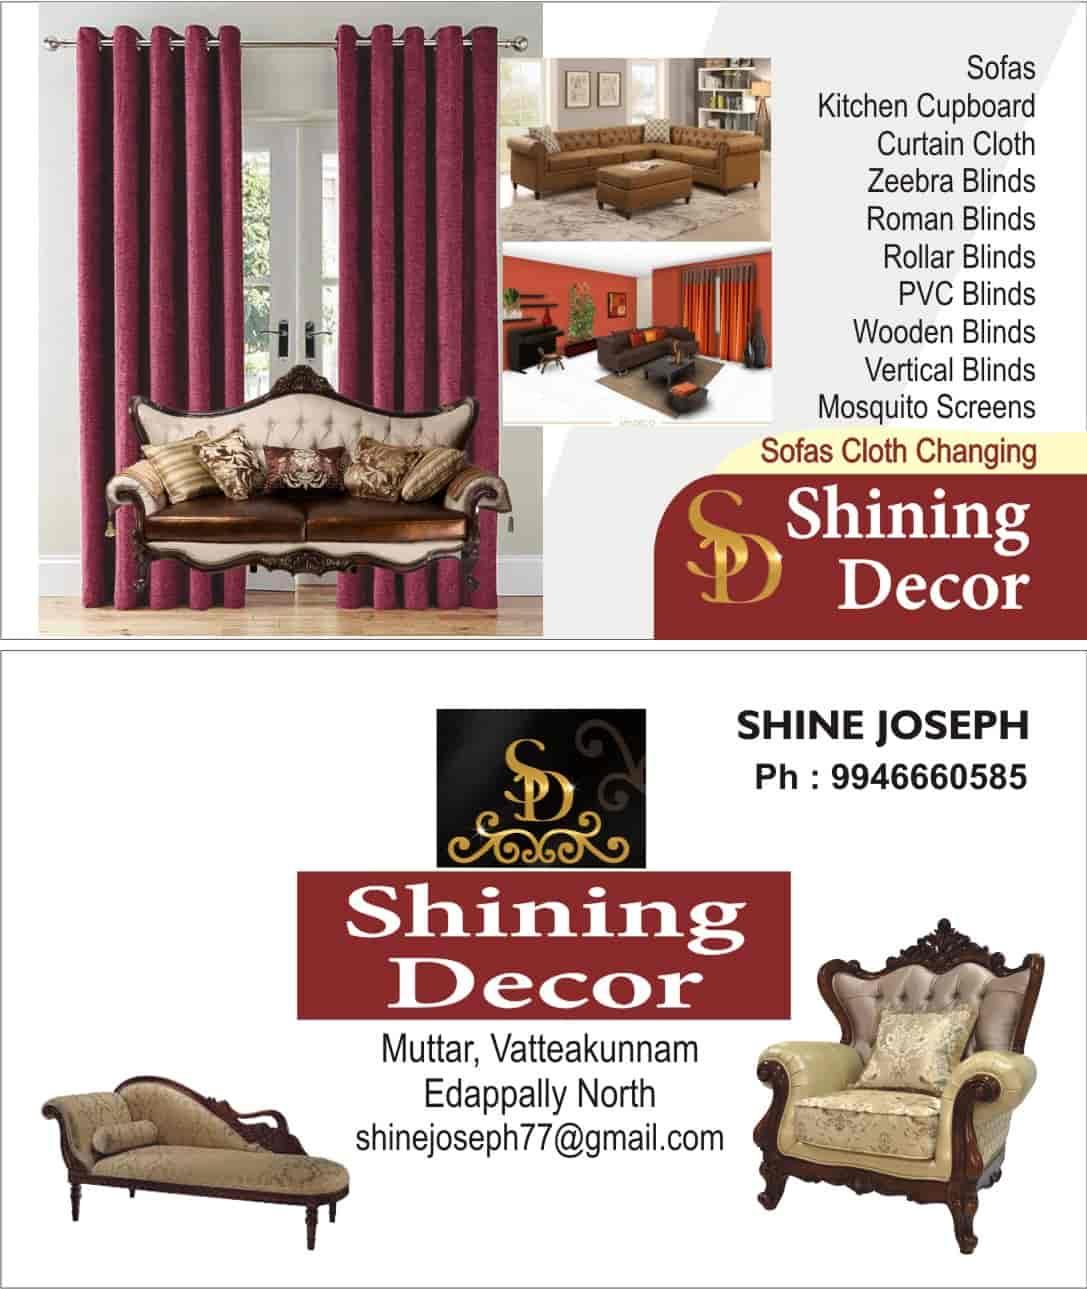 Shining Decor Edapally North Interior Designers In Ernakulam